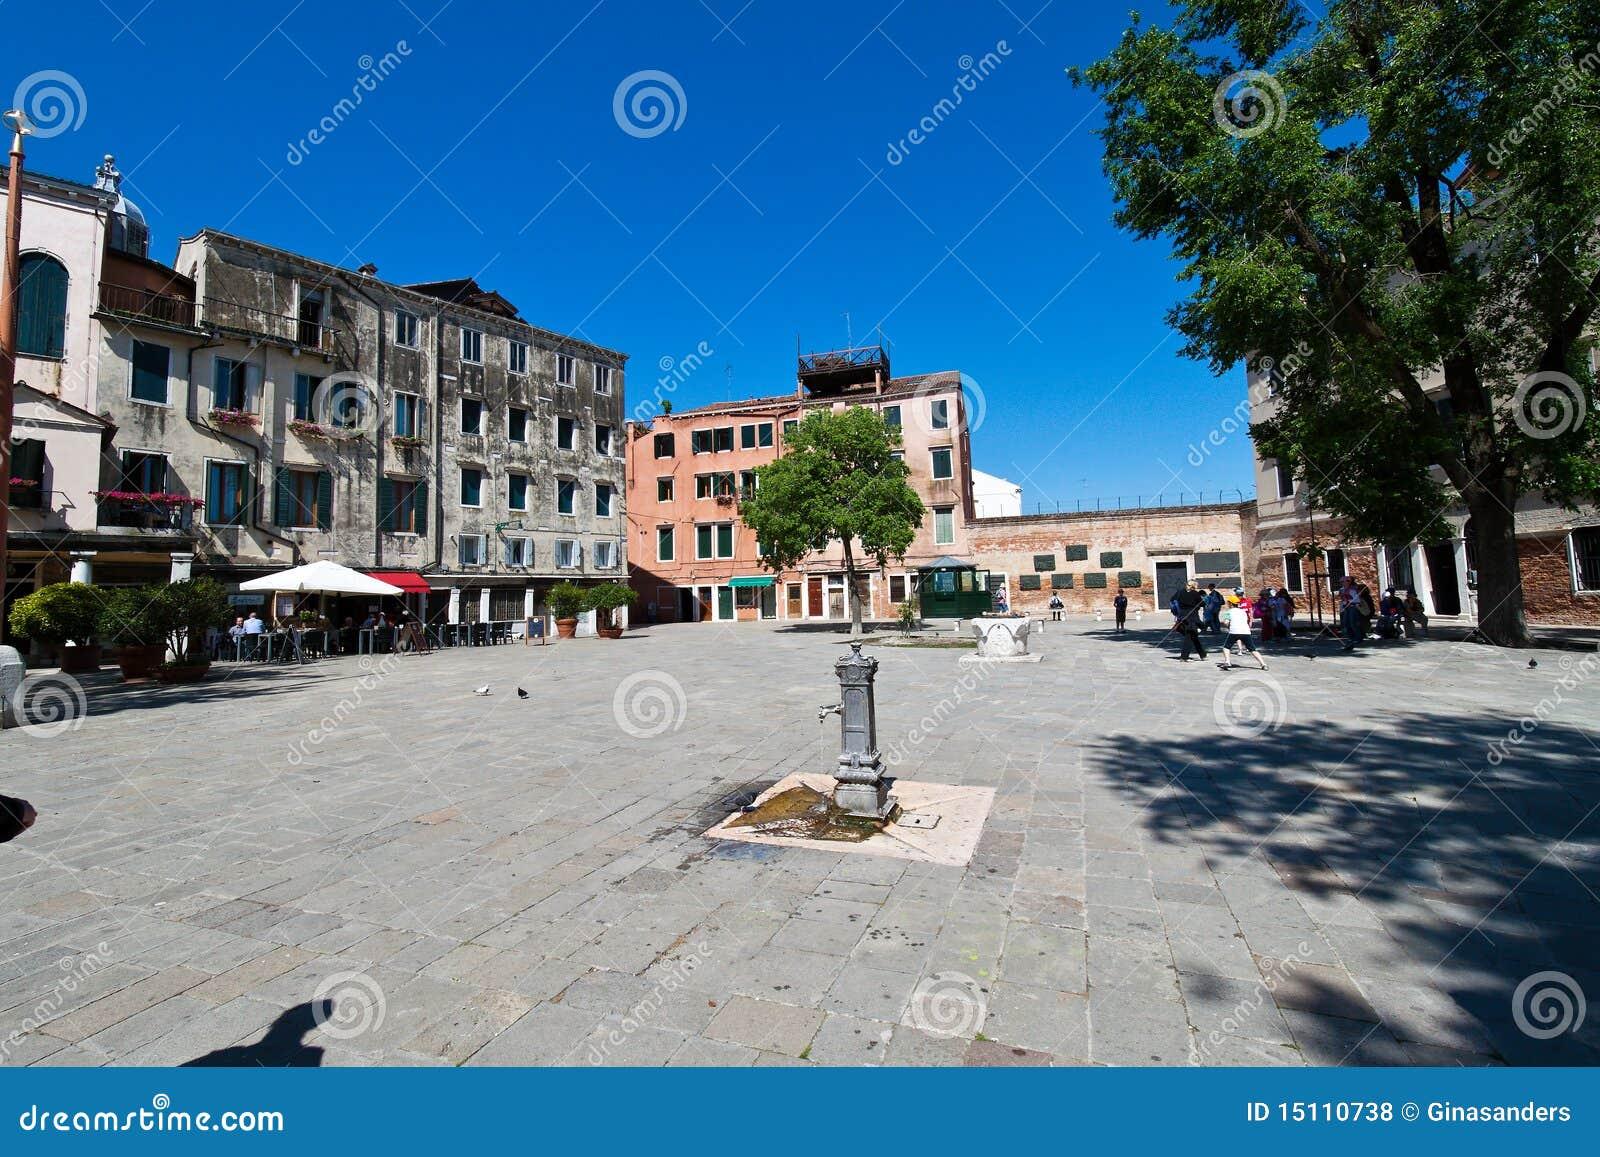 Italia, Venecia. Cuarto judío, ghetto